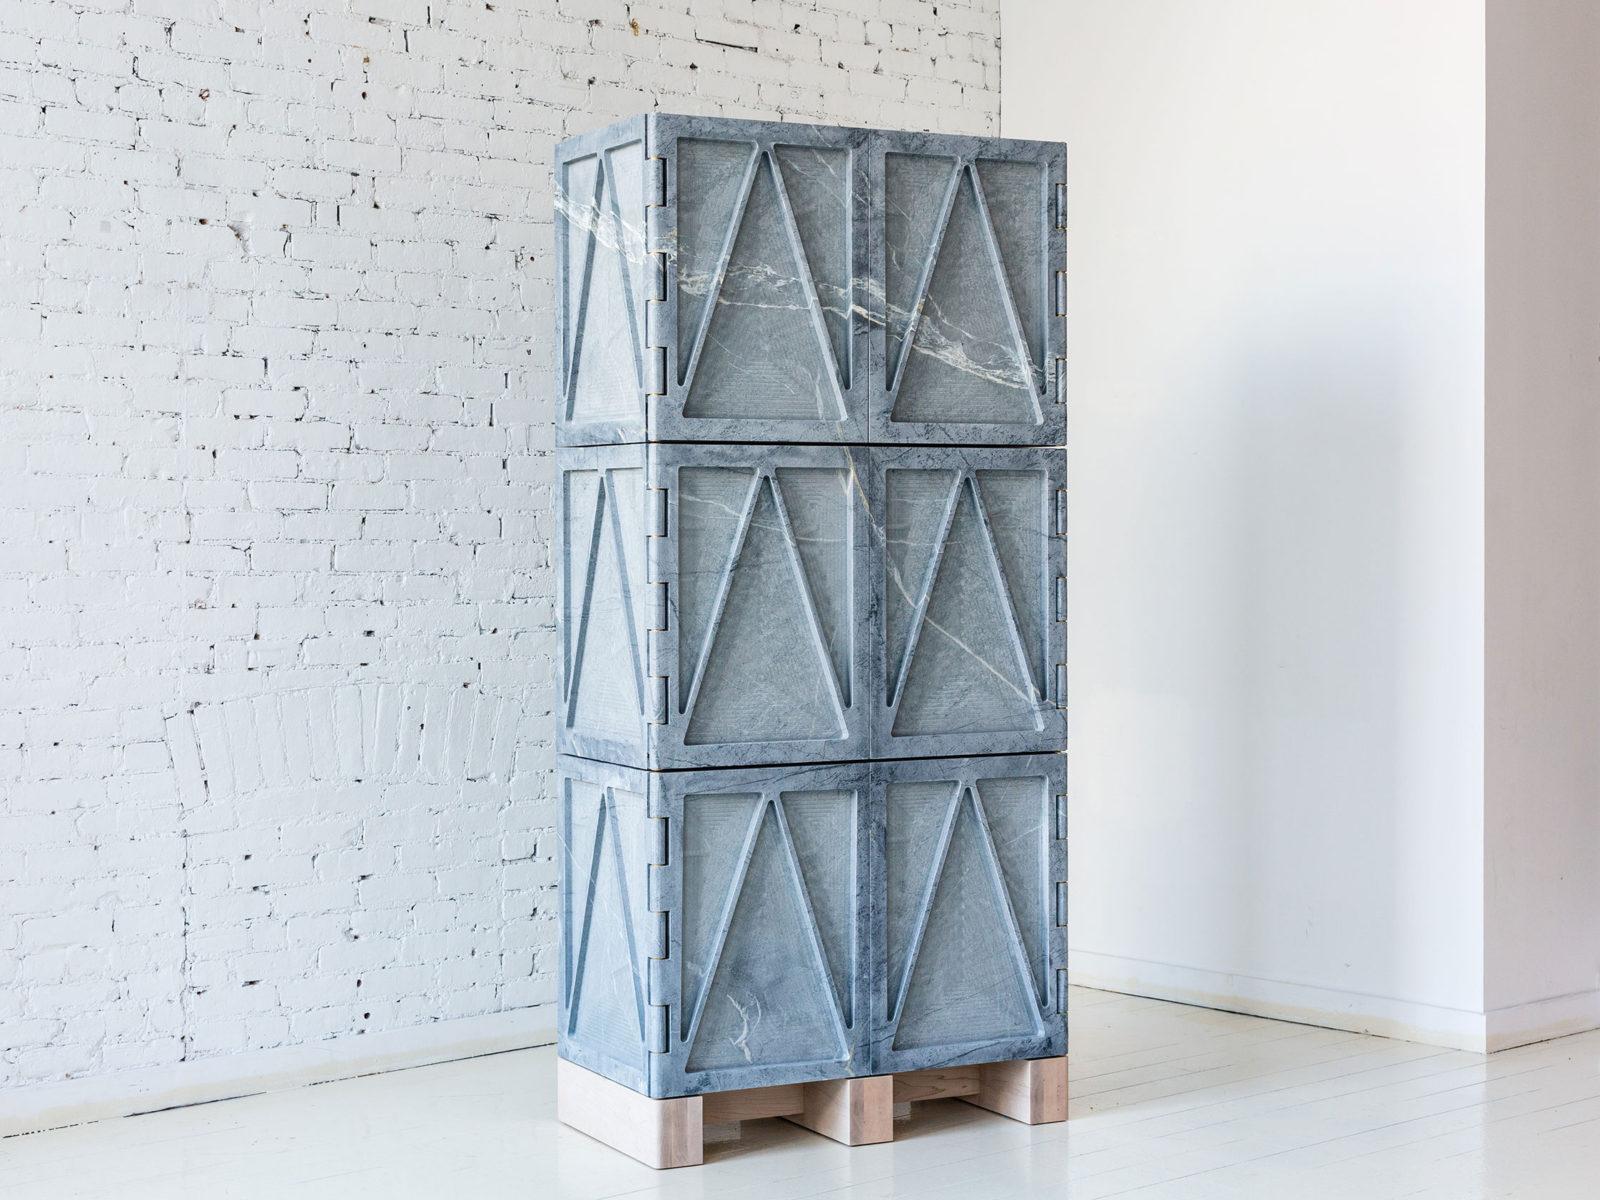 Relief Stone Cabinet - Photo: Brian Ferry